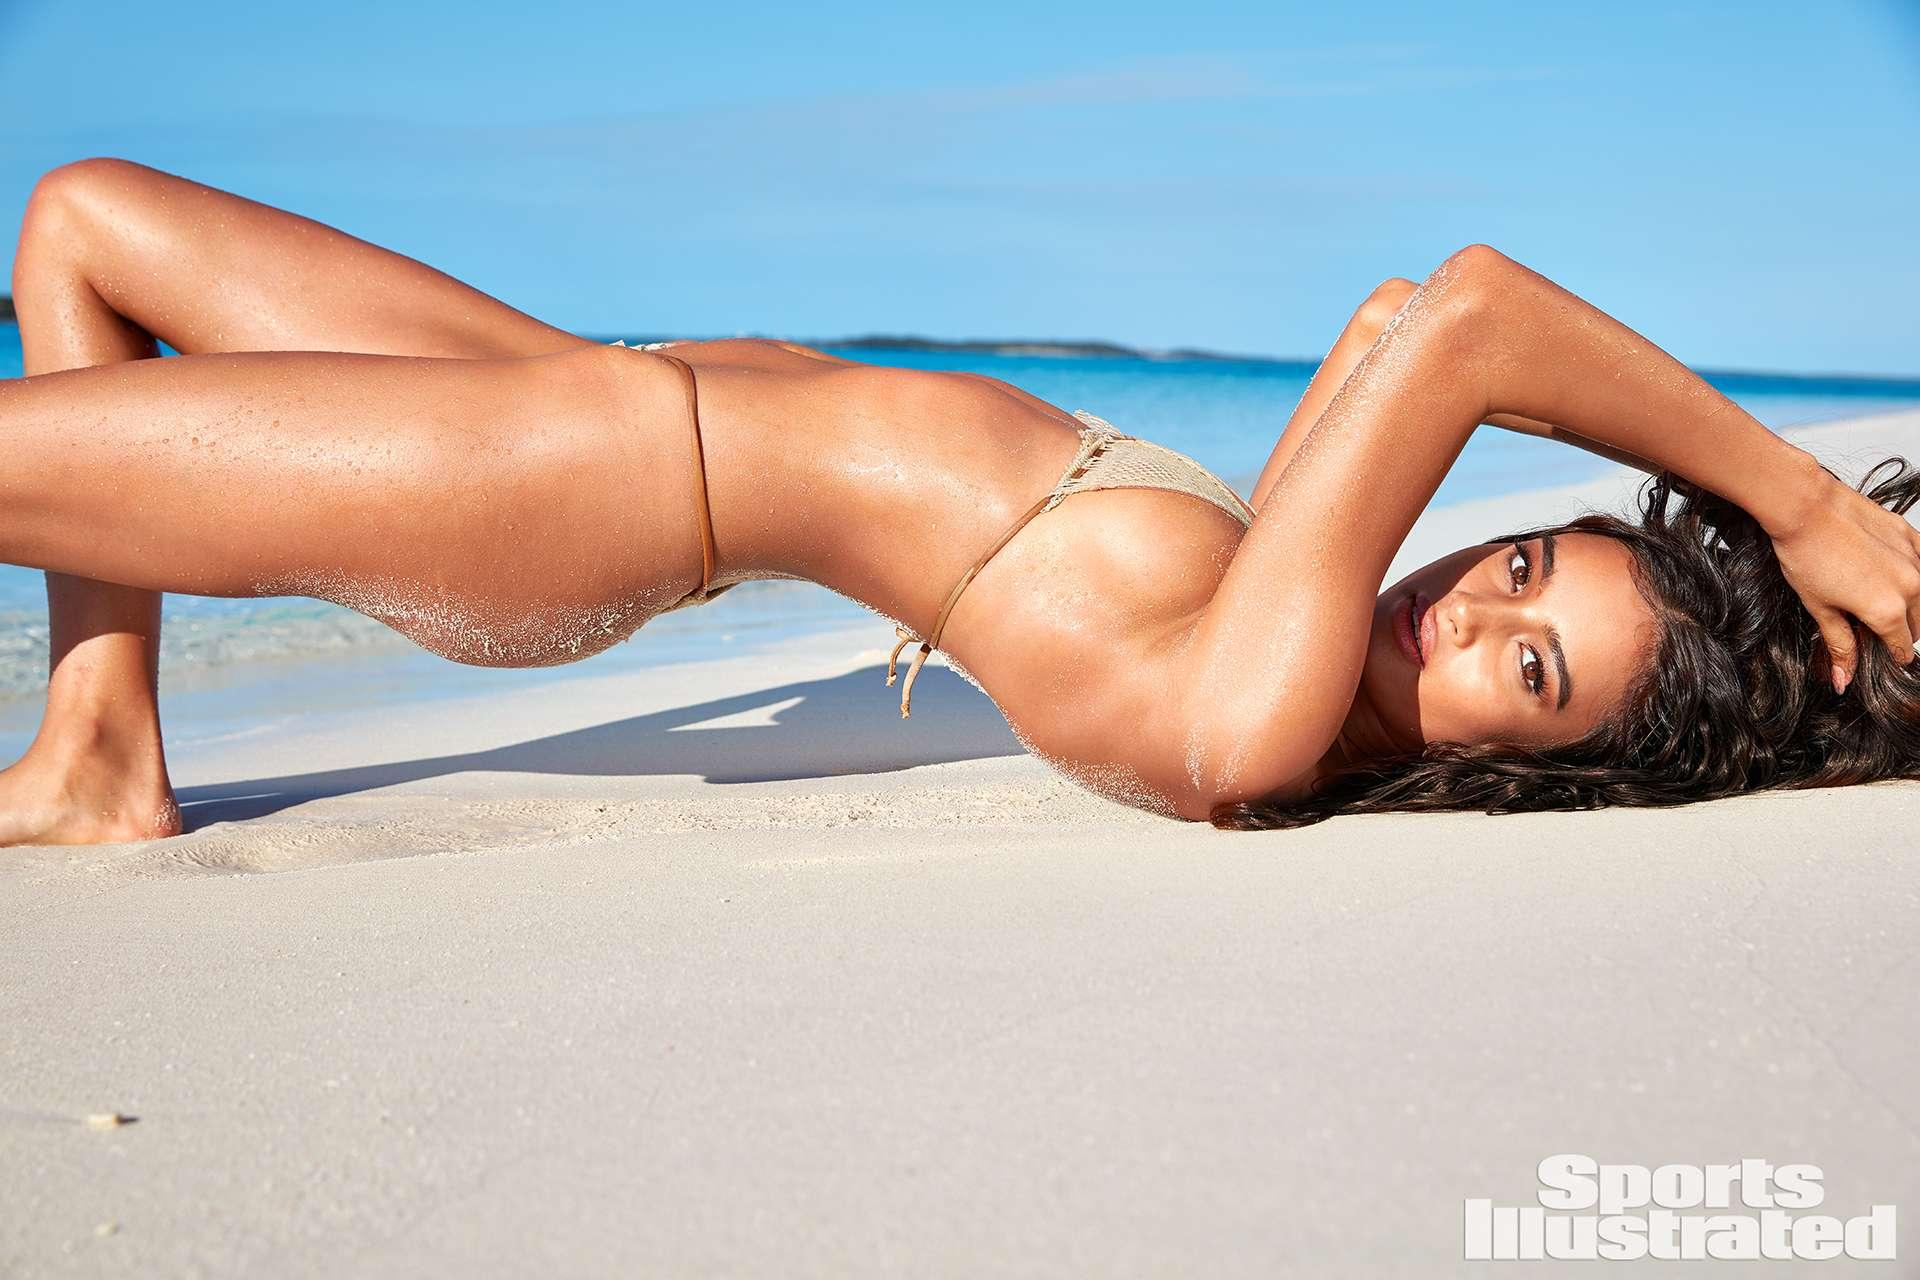 Great Exuma: Kelsey Merritt für die Sports Illustrated Swimsuit Issue 11